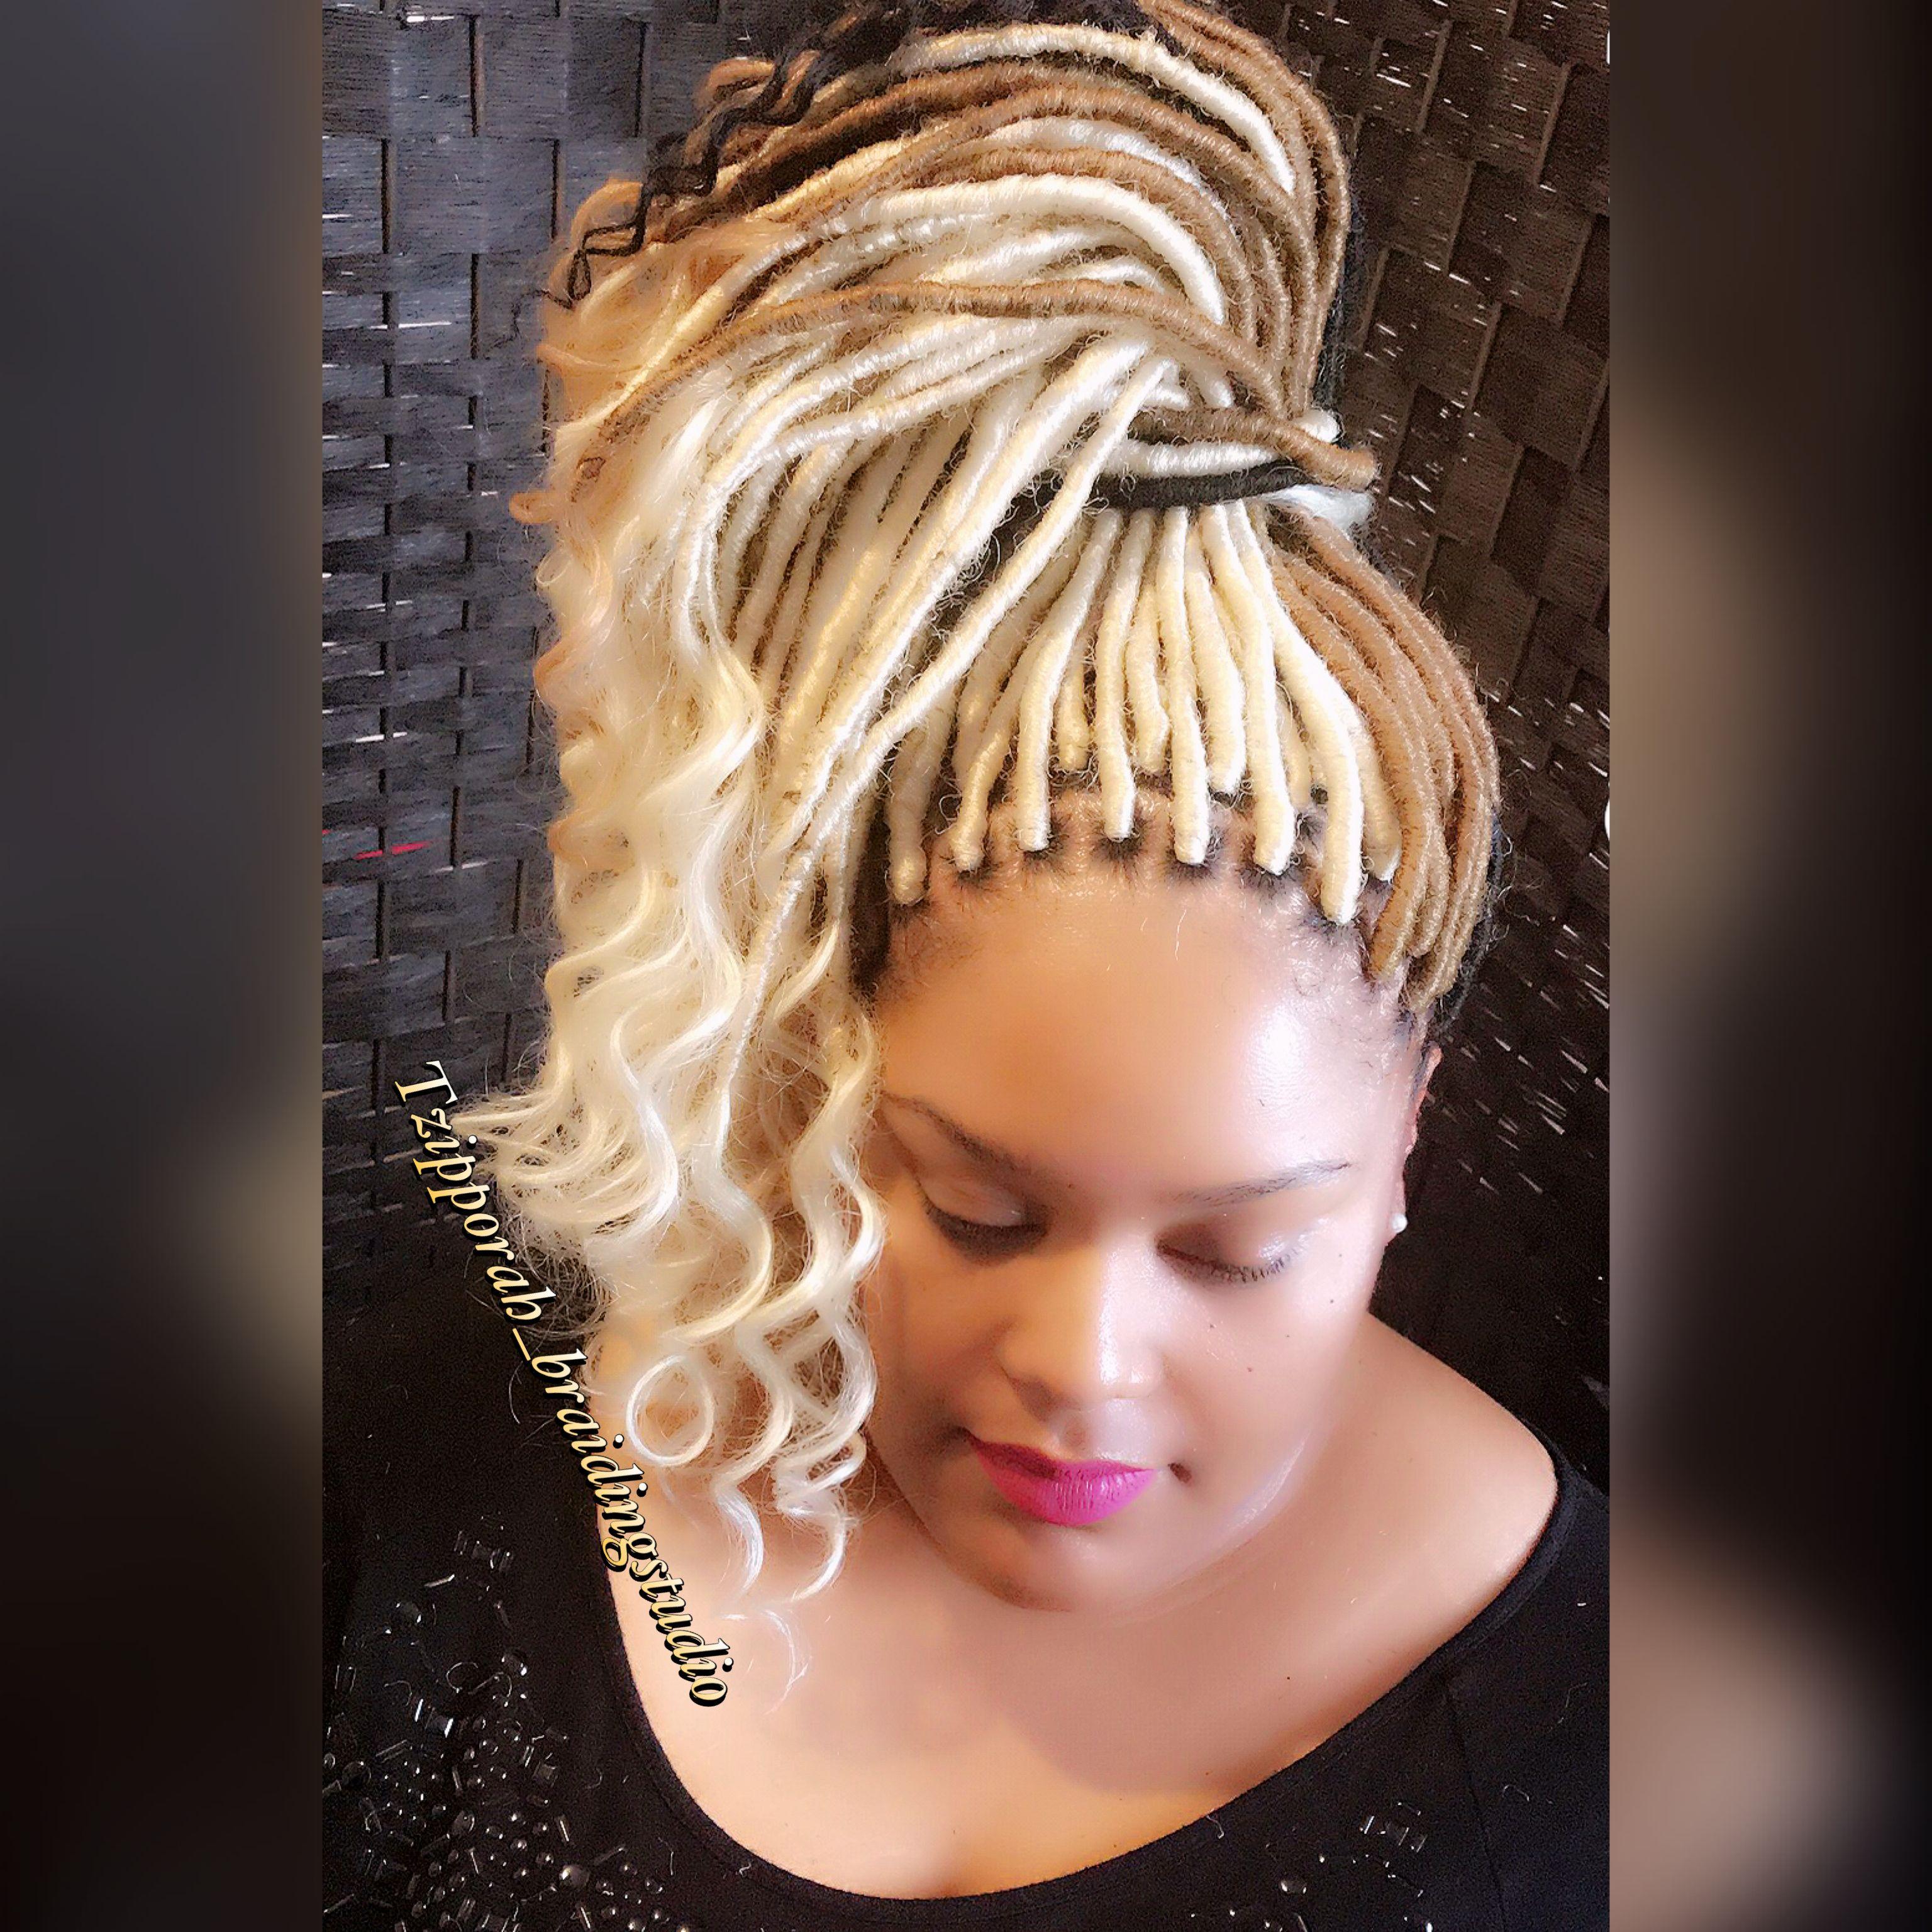 Pin by latoya stevens on braids pinterest hair style faux locs